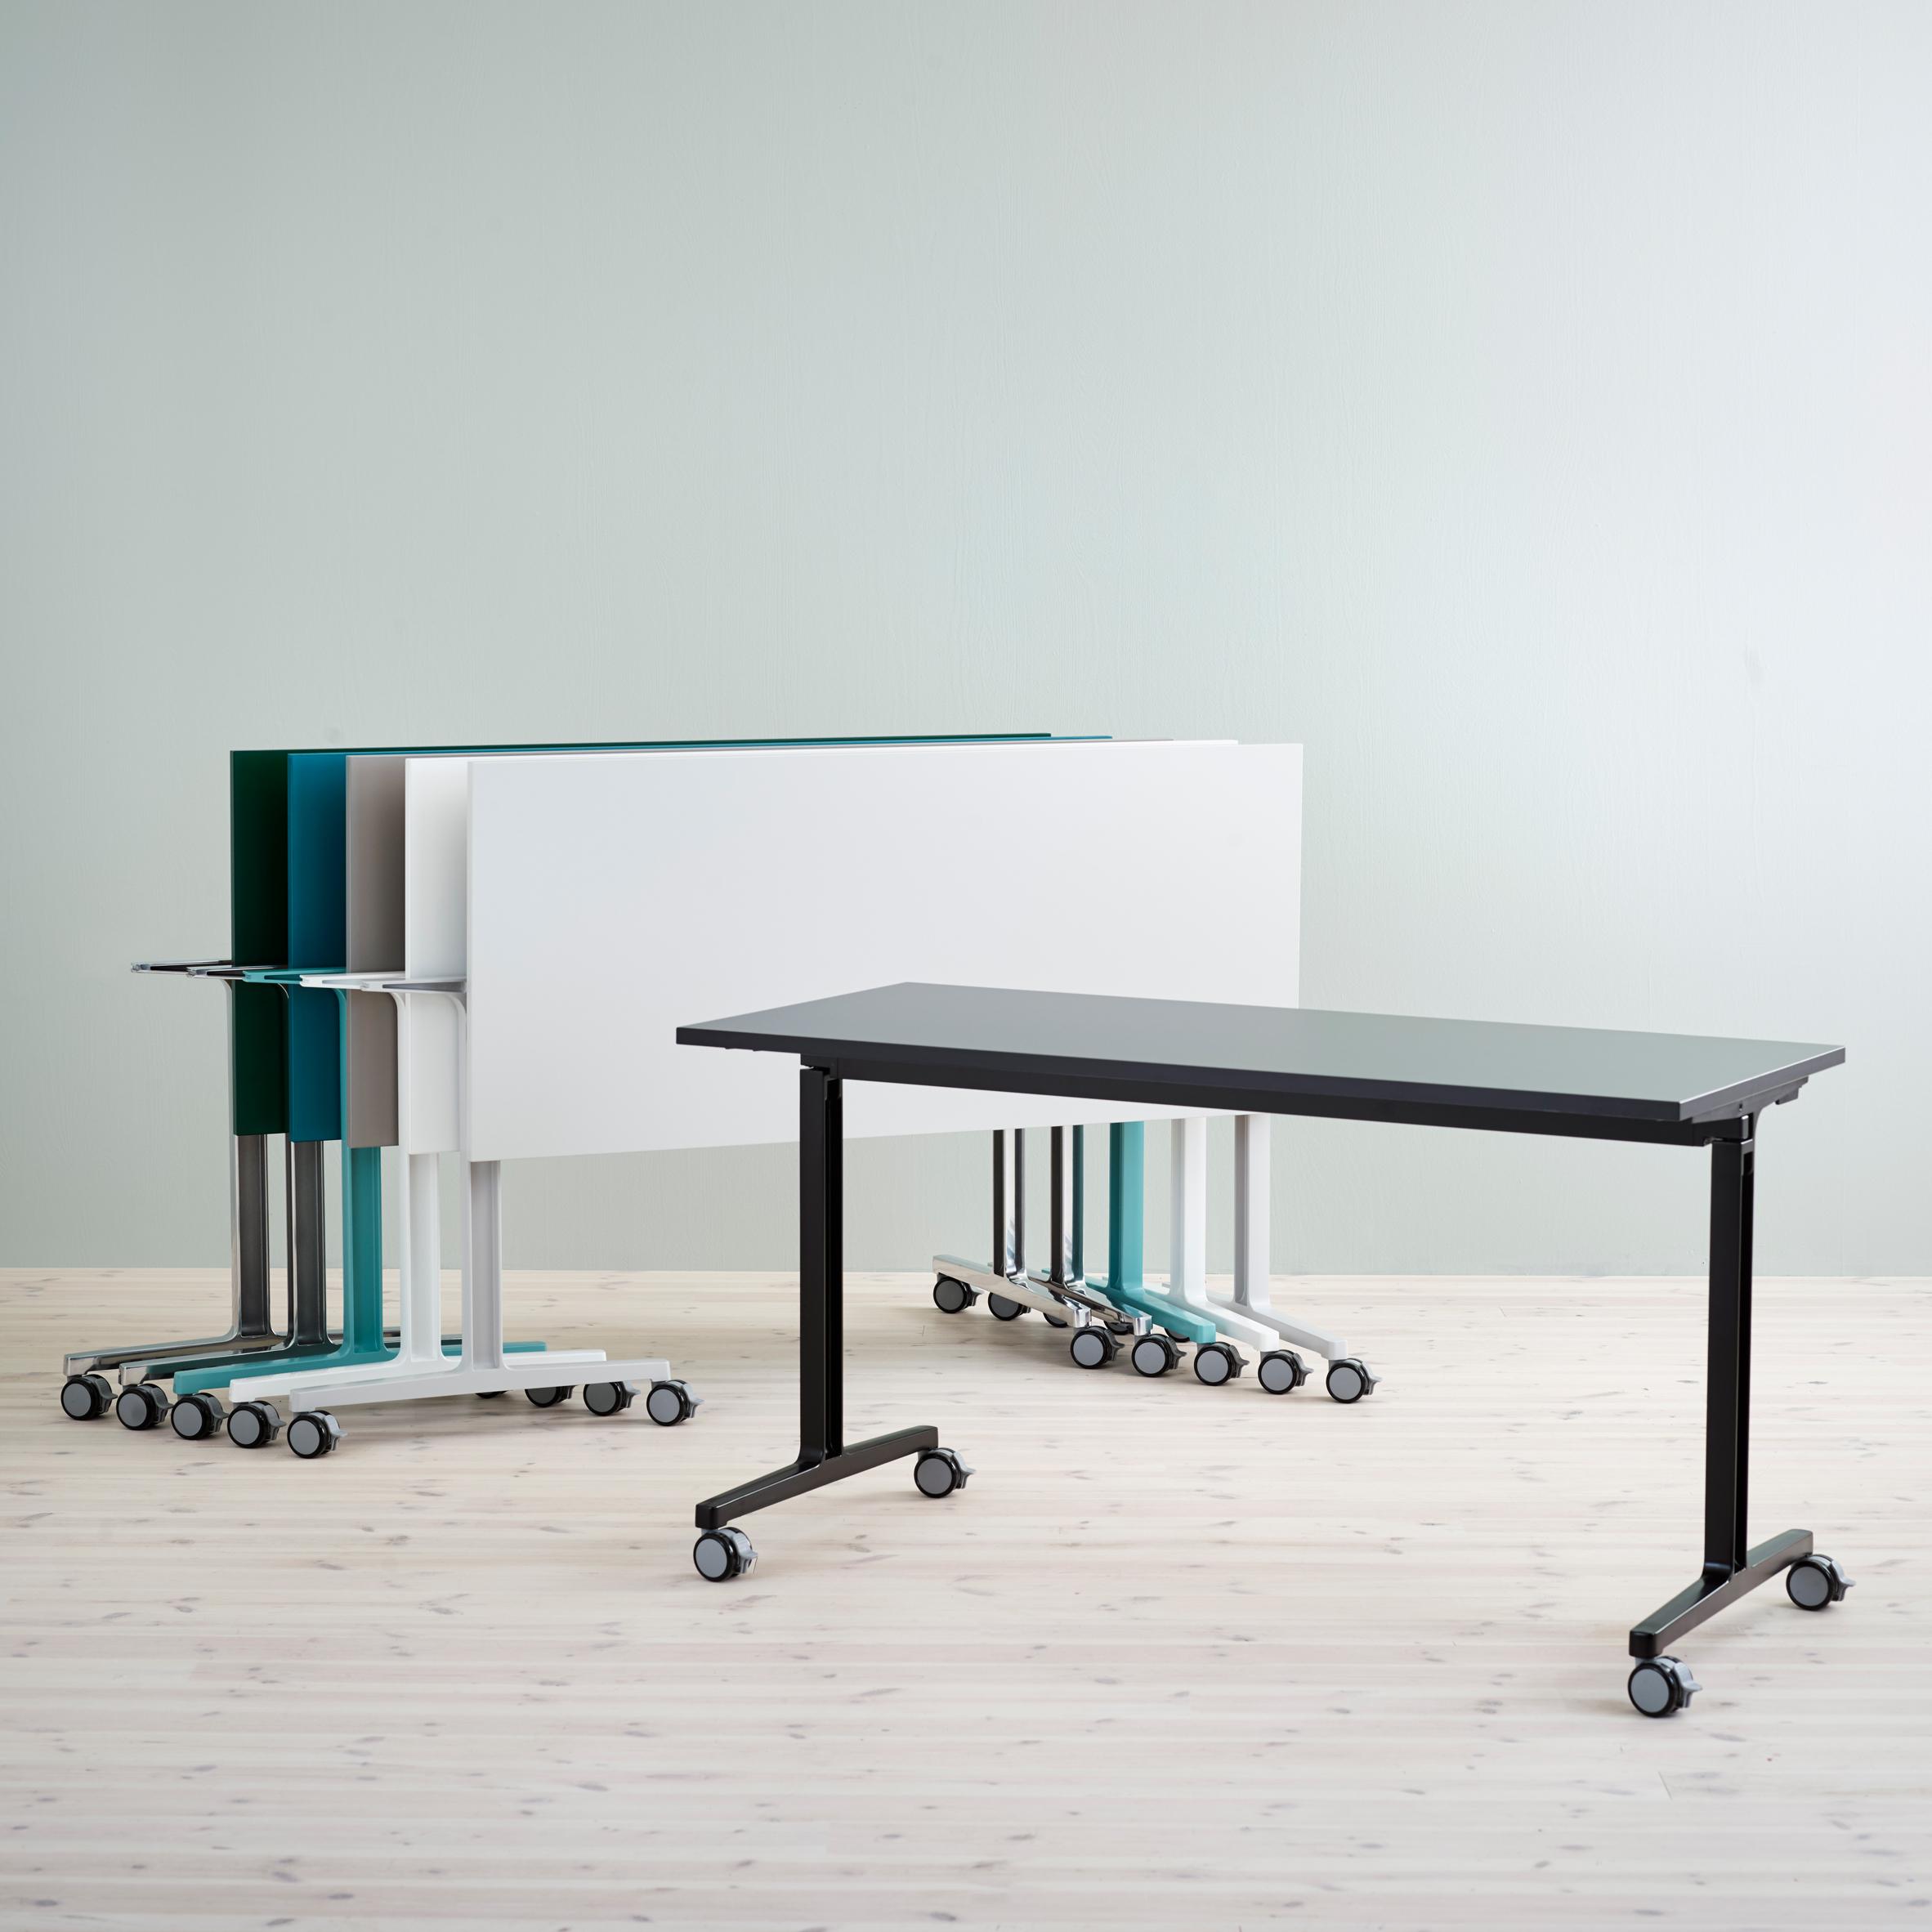 RBM u-Connect table by Acer Design for Flokk